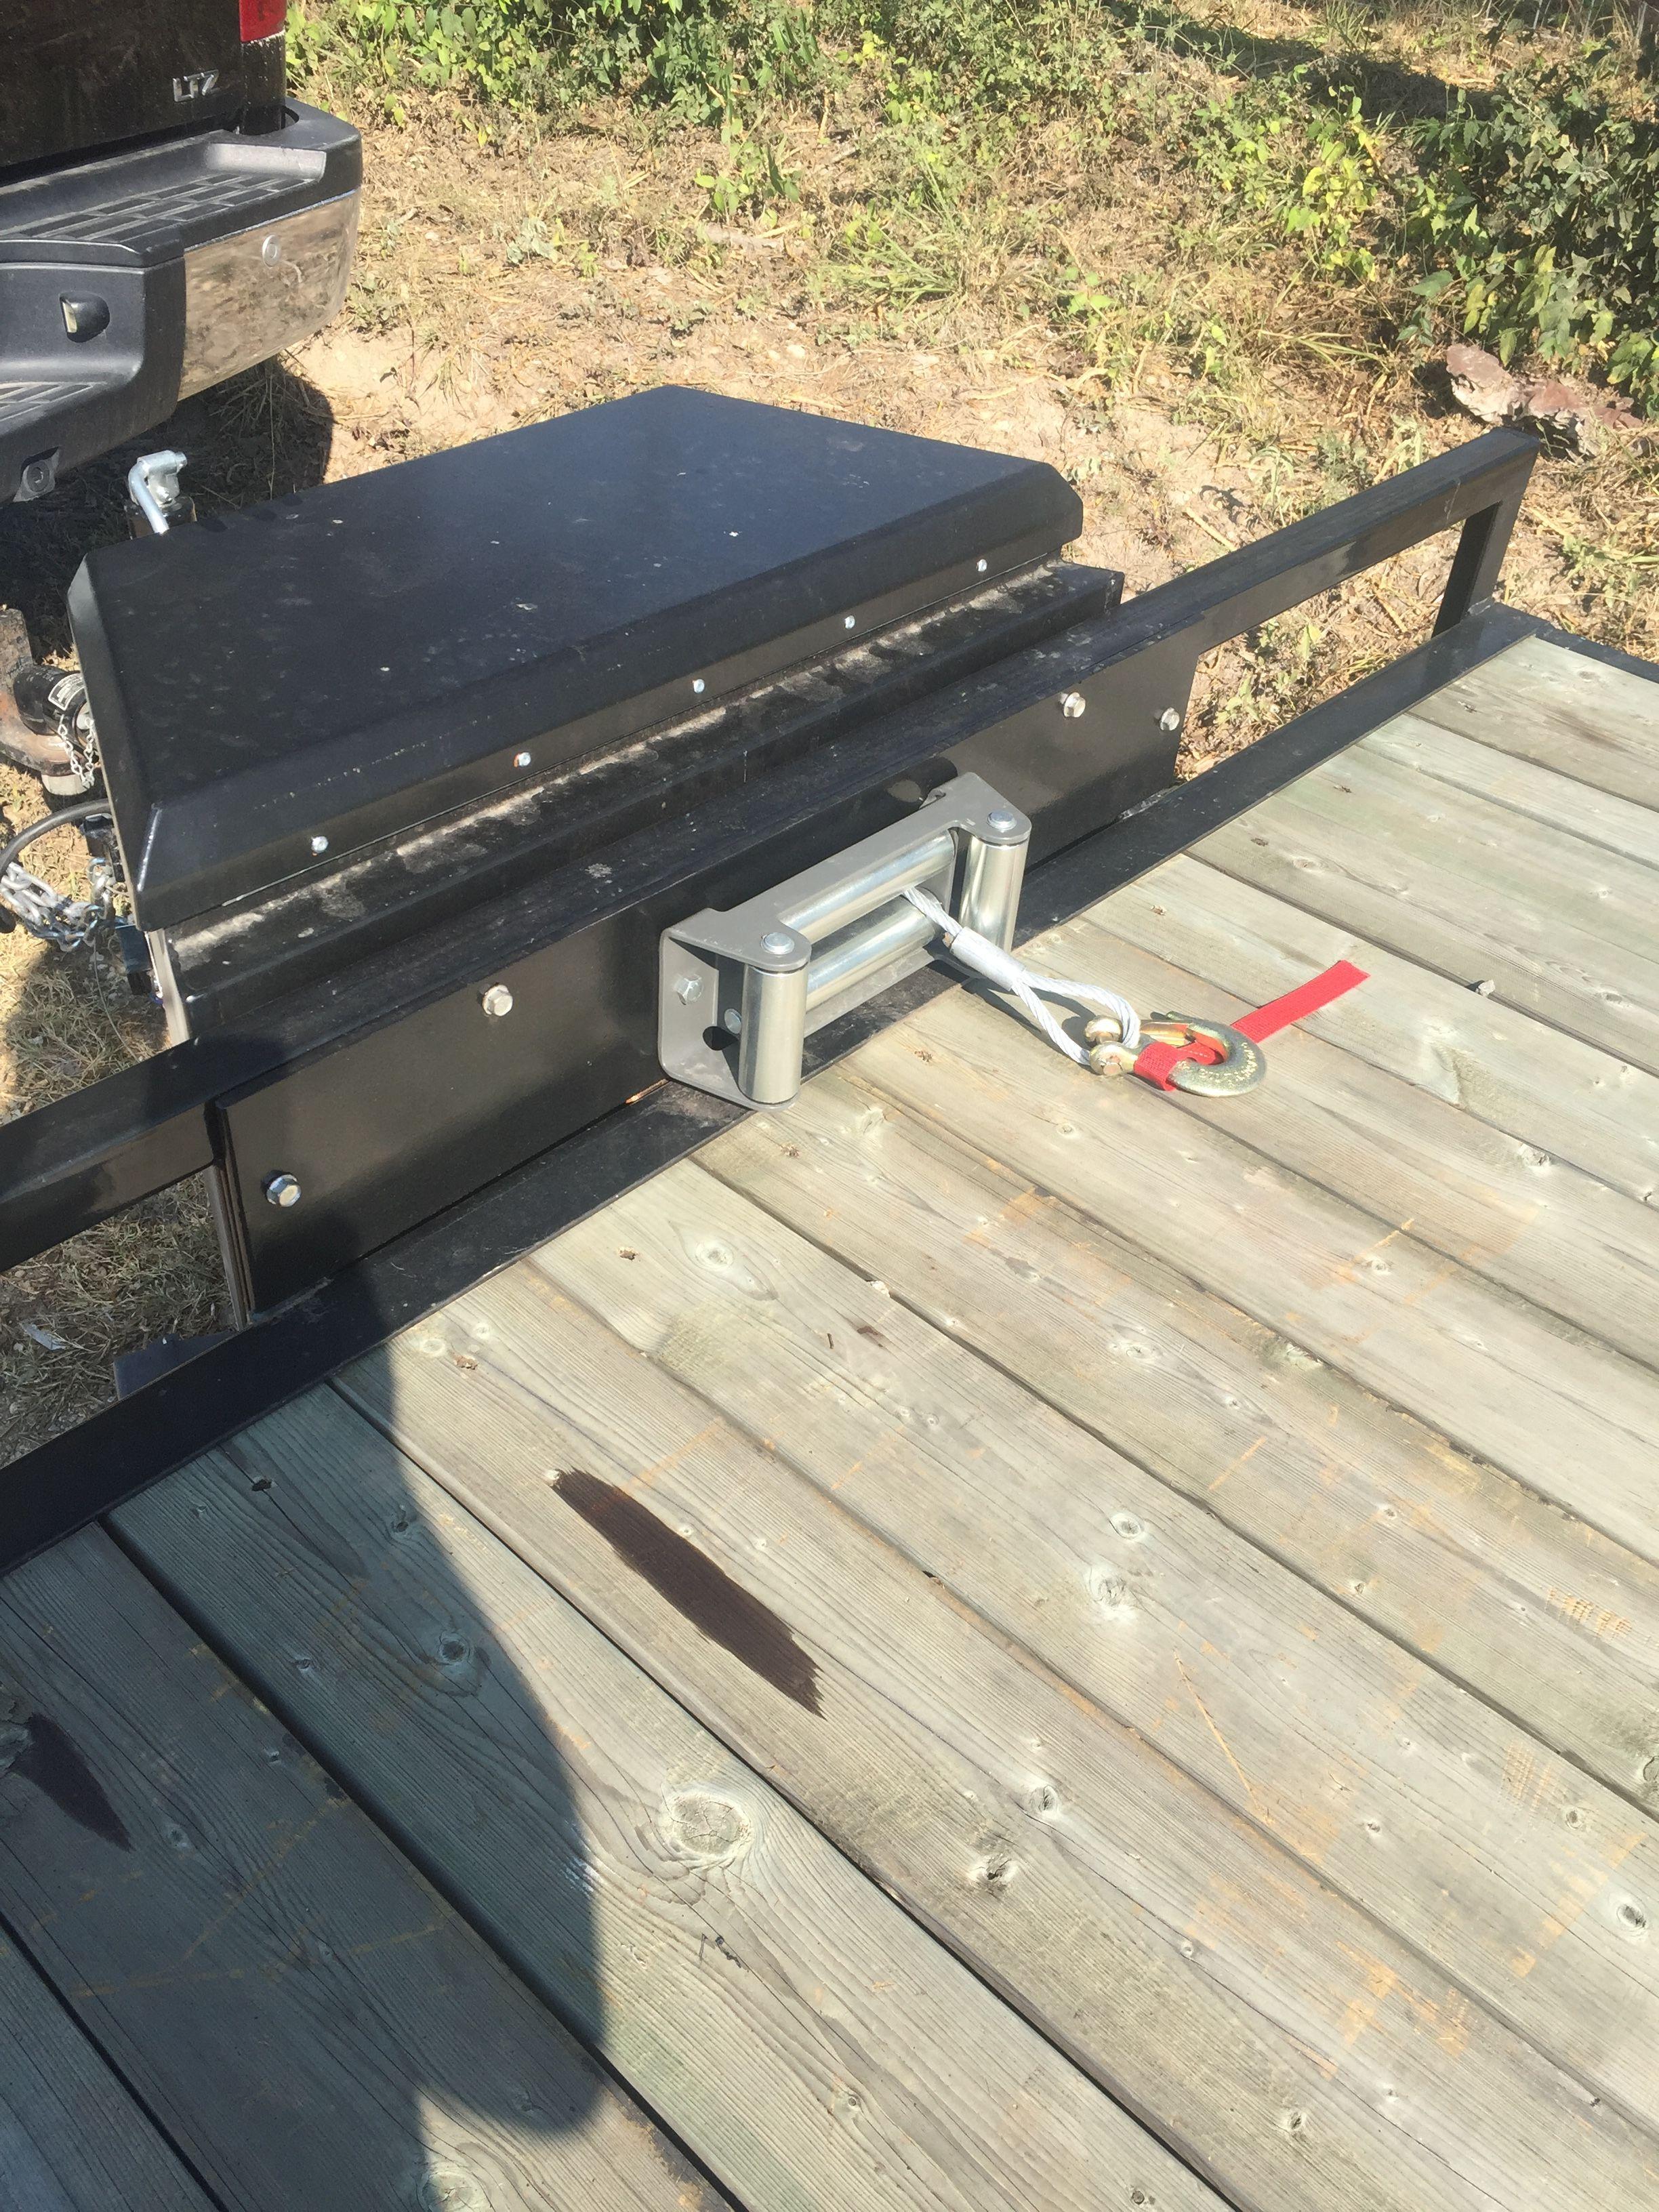 Winch tool box | Garage ideas | Pinterest | Box, Utility trailer and ...